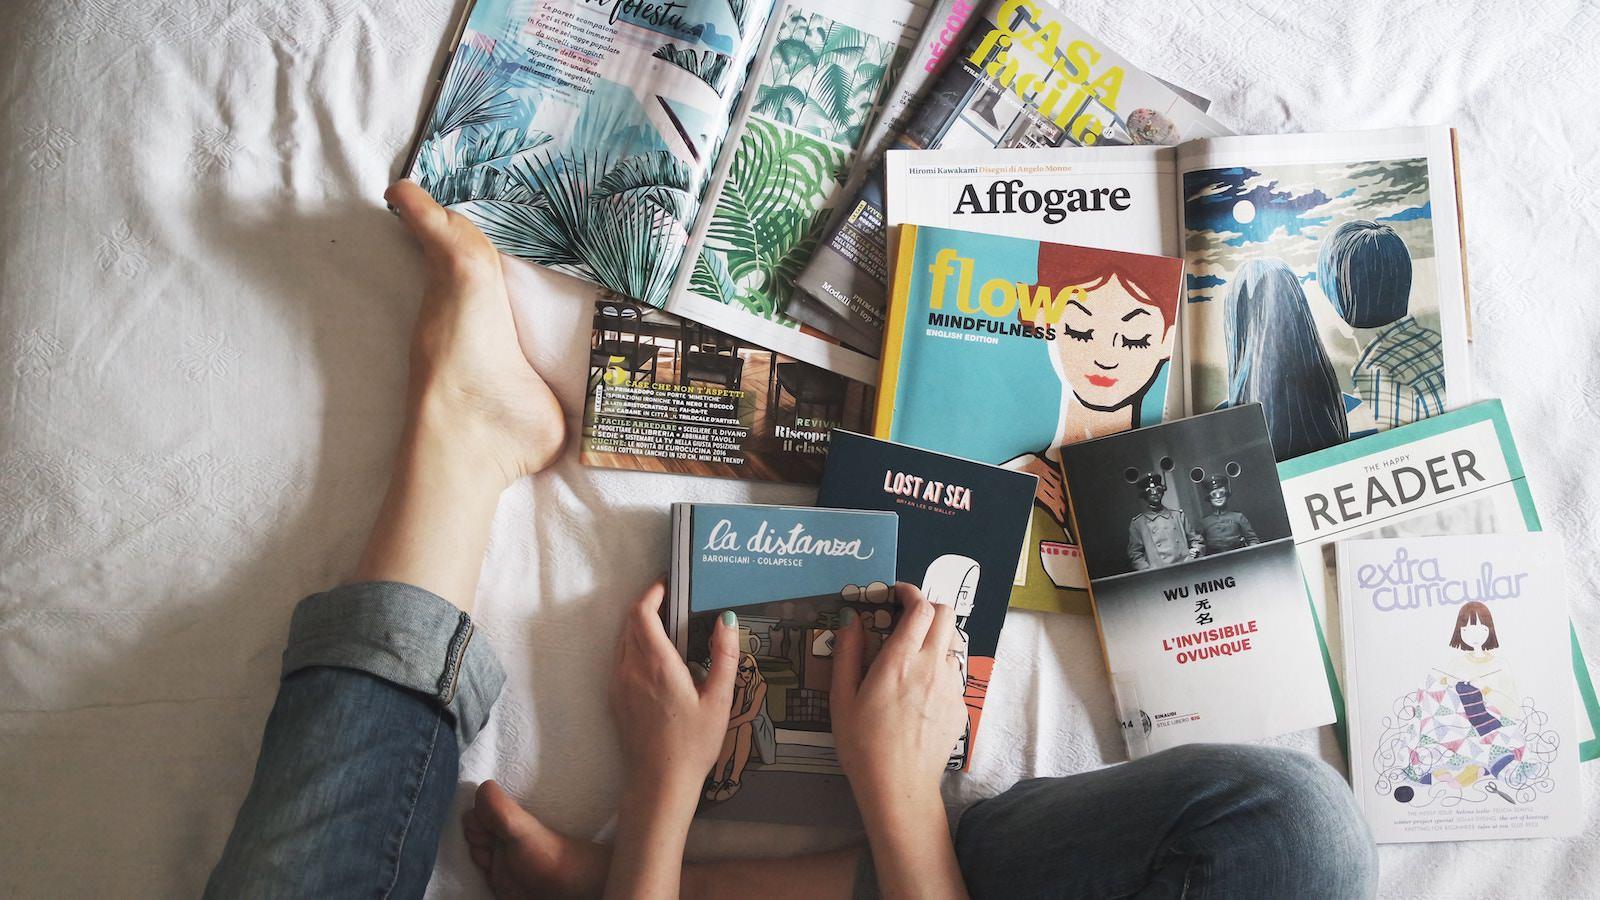 Giulia bertelli 104575 unsplash magazines